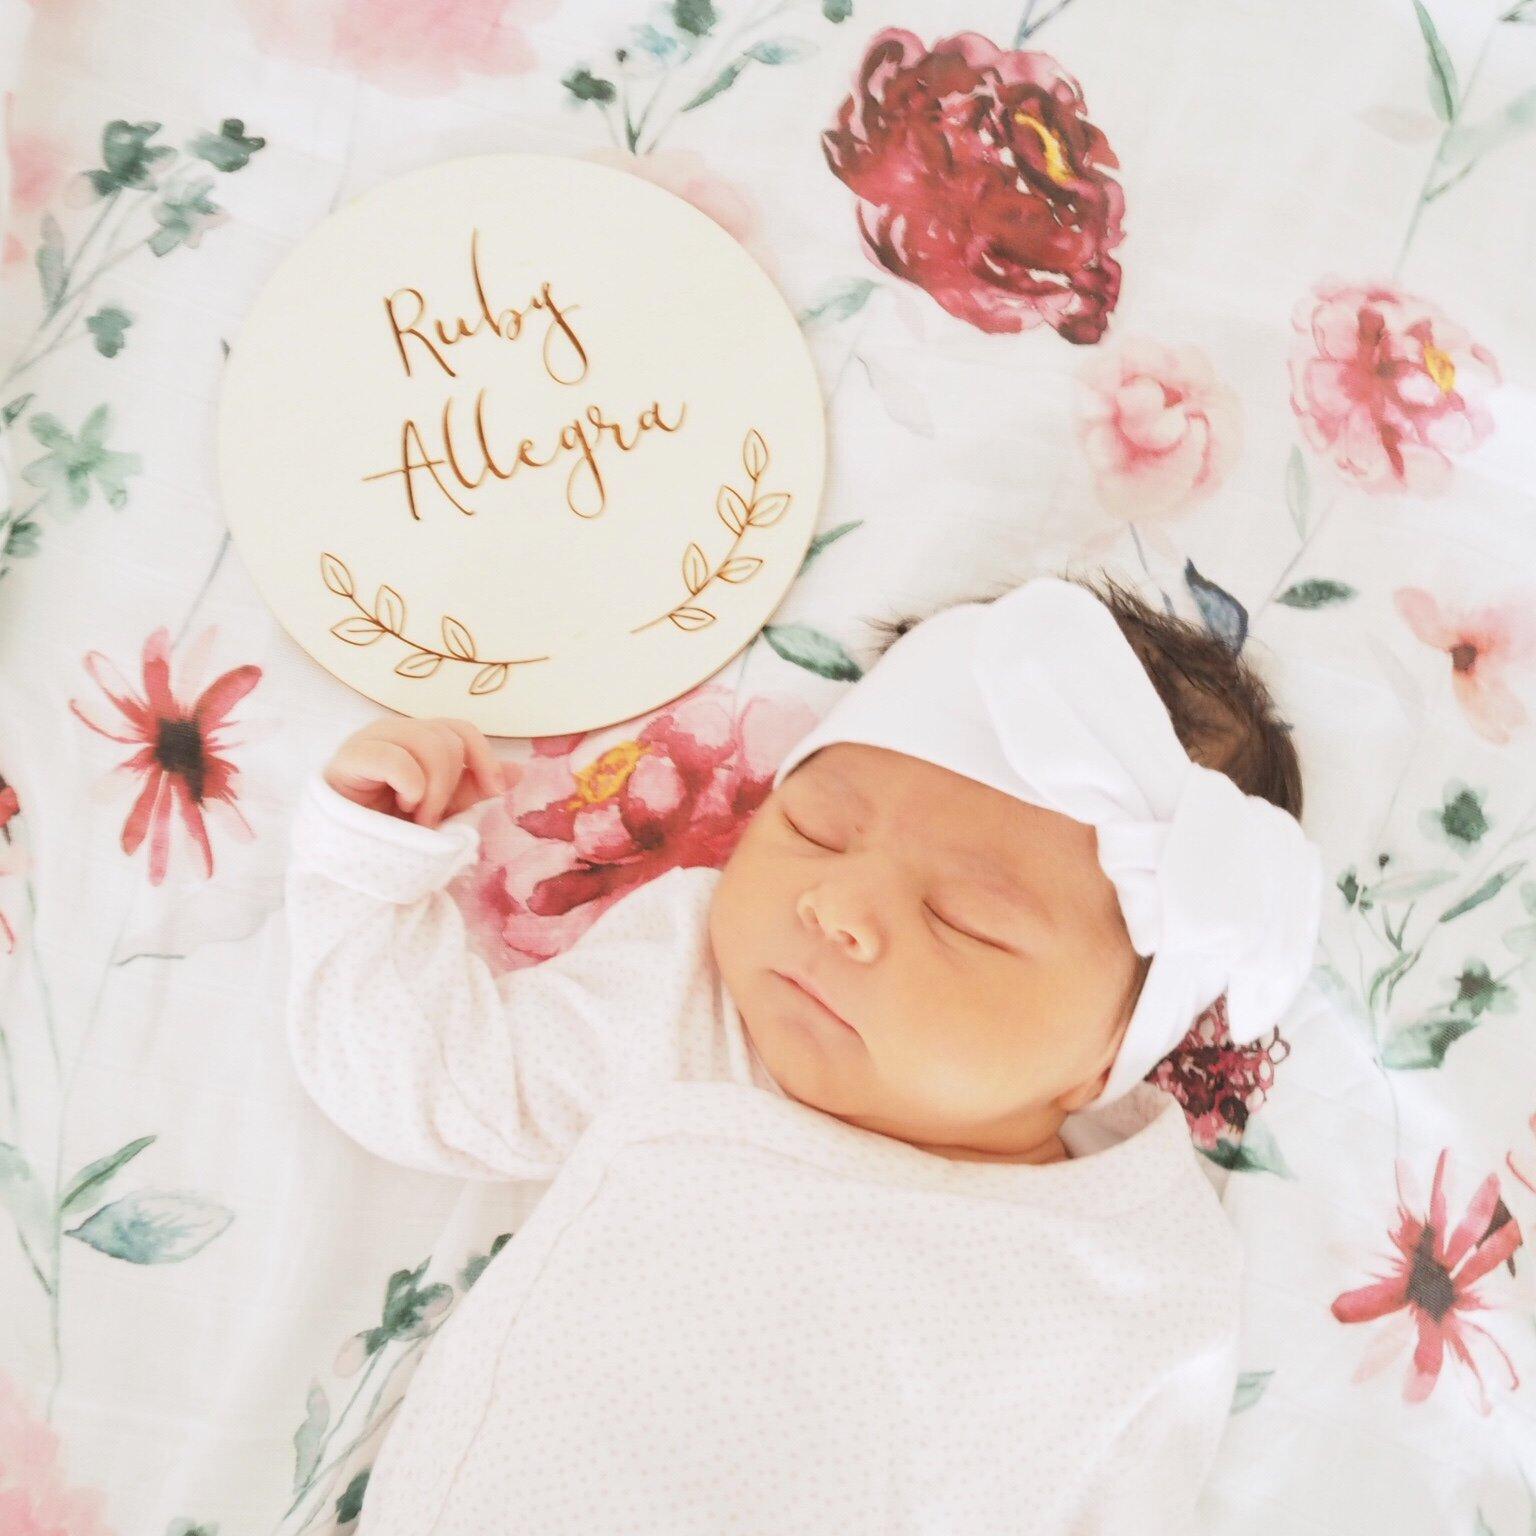 Ruby Allegra Laurennatalia.co